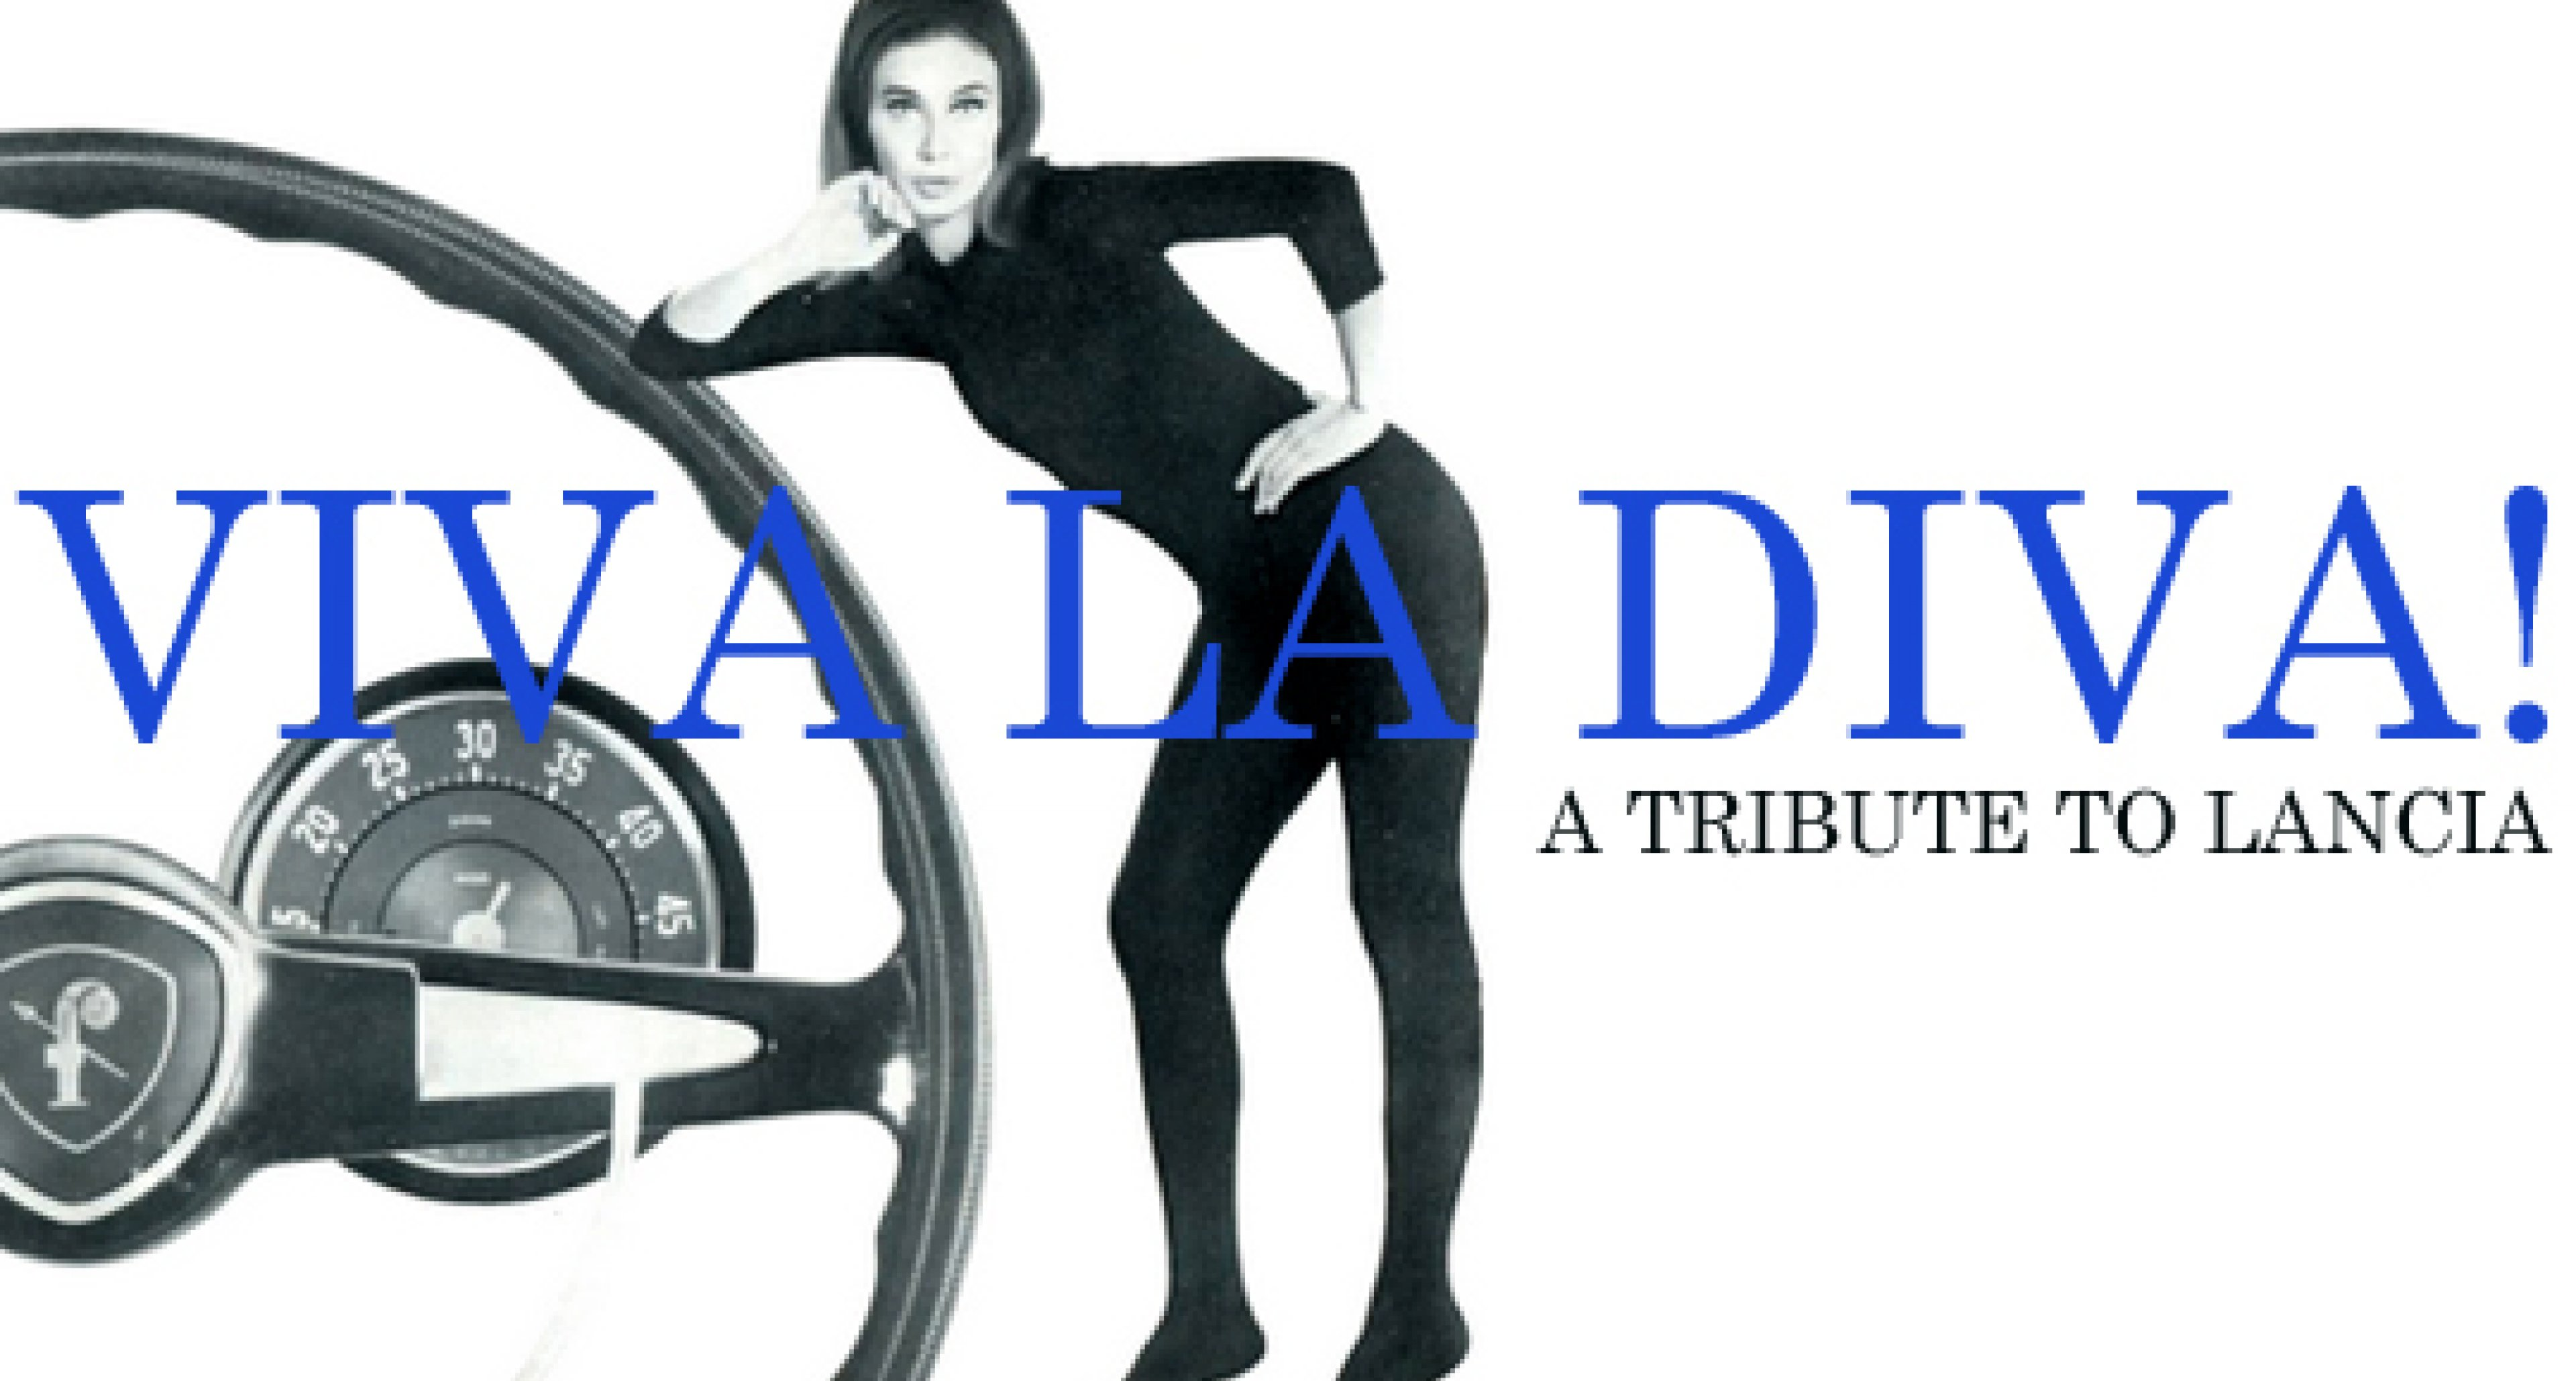 Viva la Diva! A Tribute to Lancia